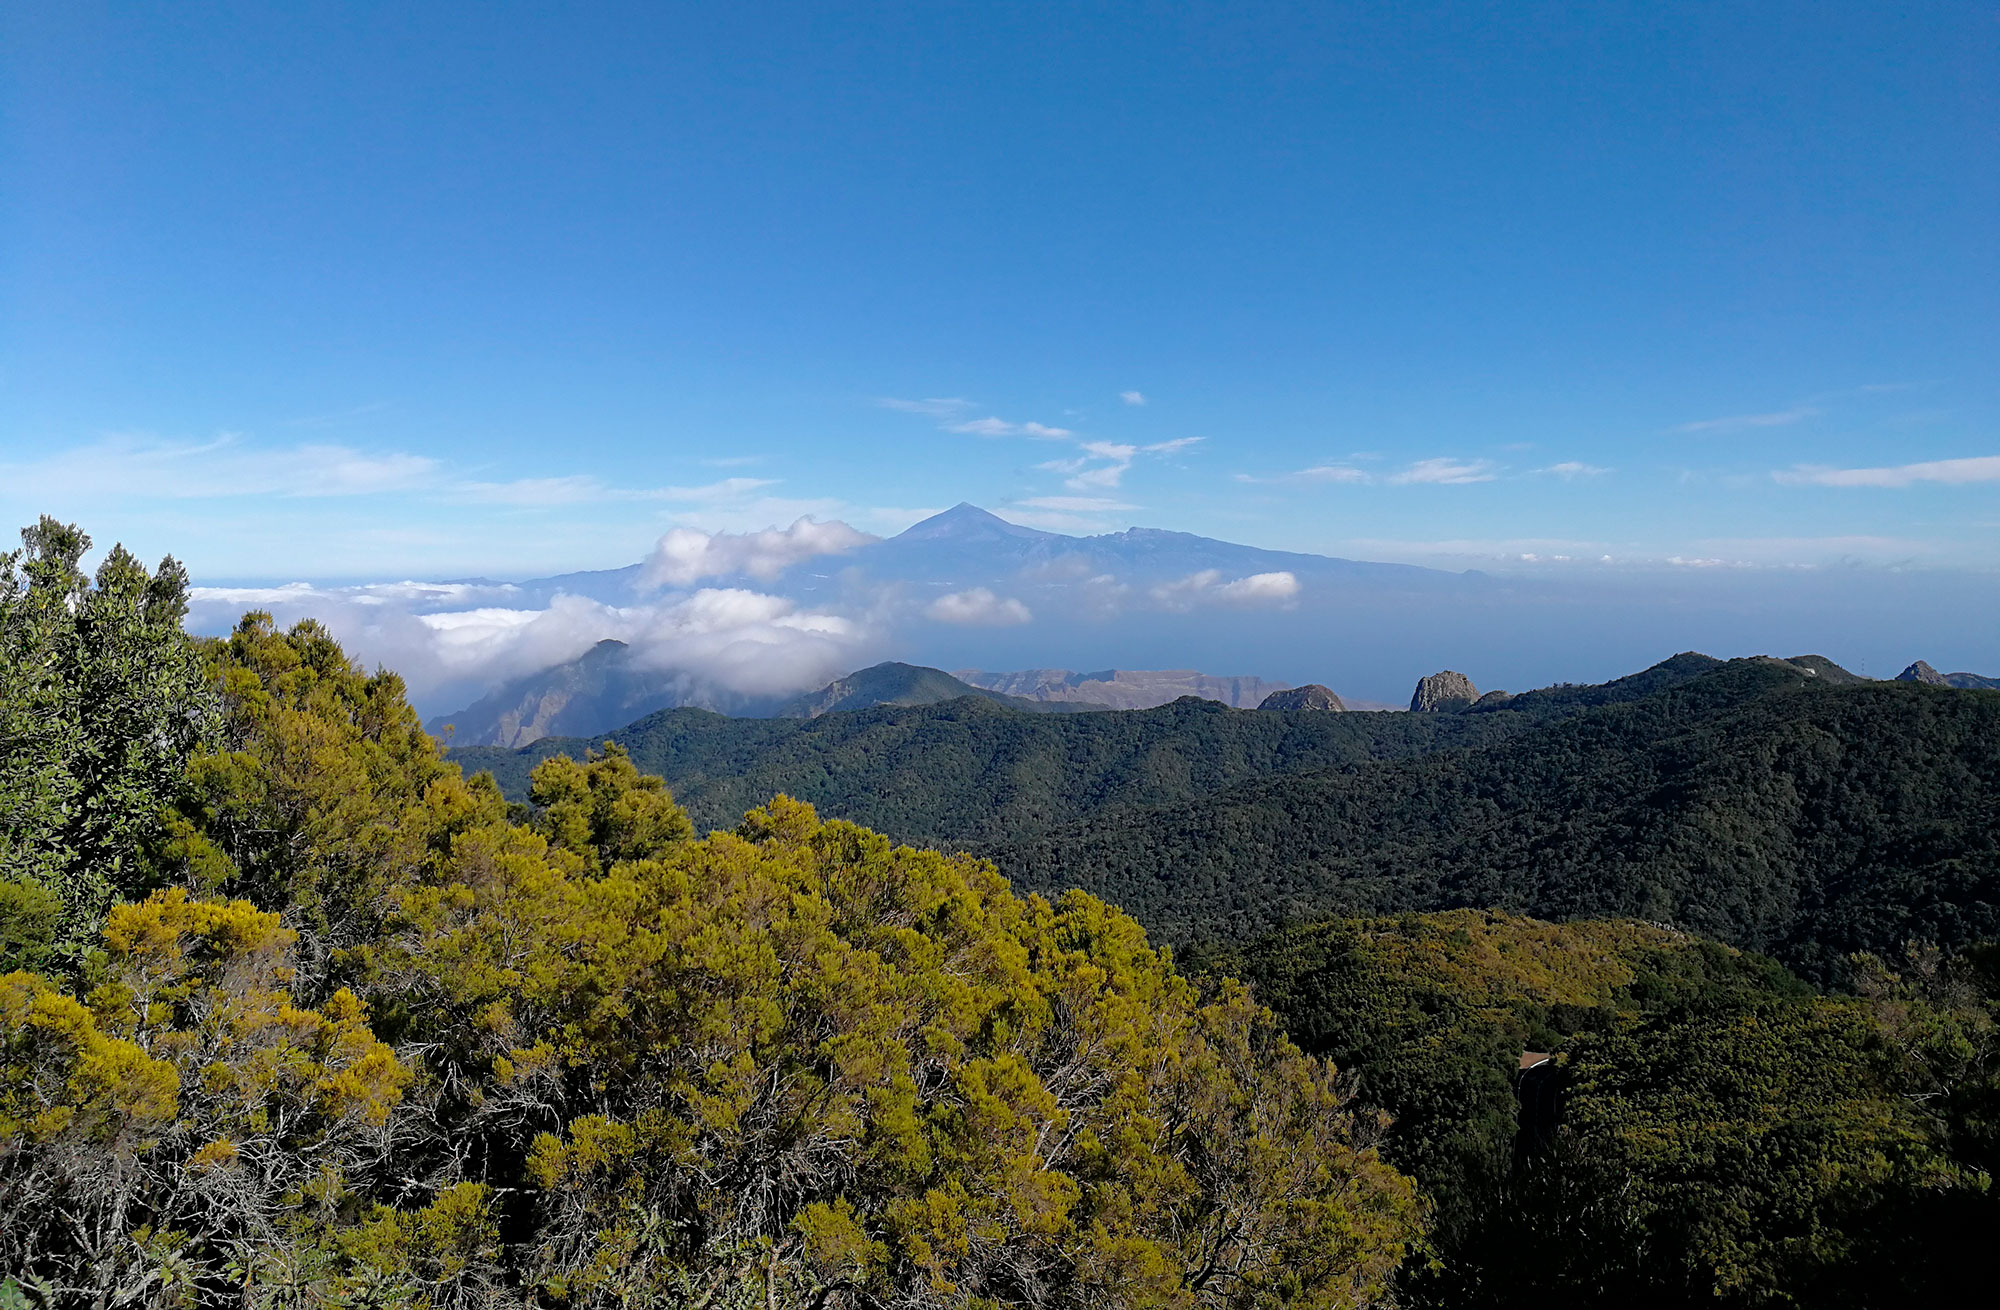 Naturaleza mágica, paisajes increibles, Islas Canarias - España- imagen #1